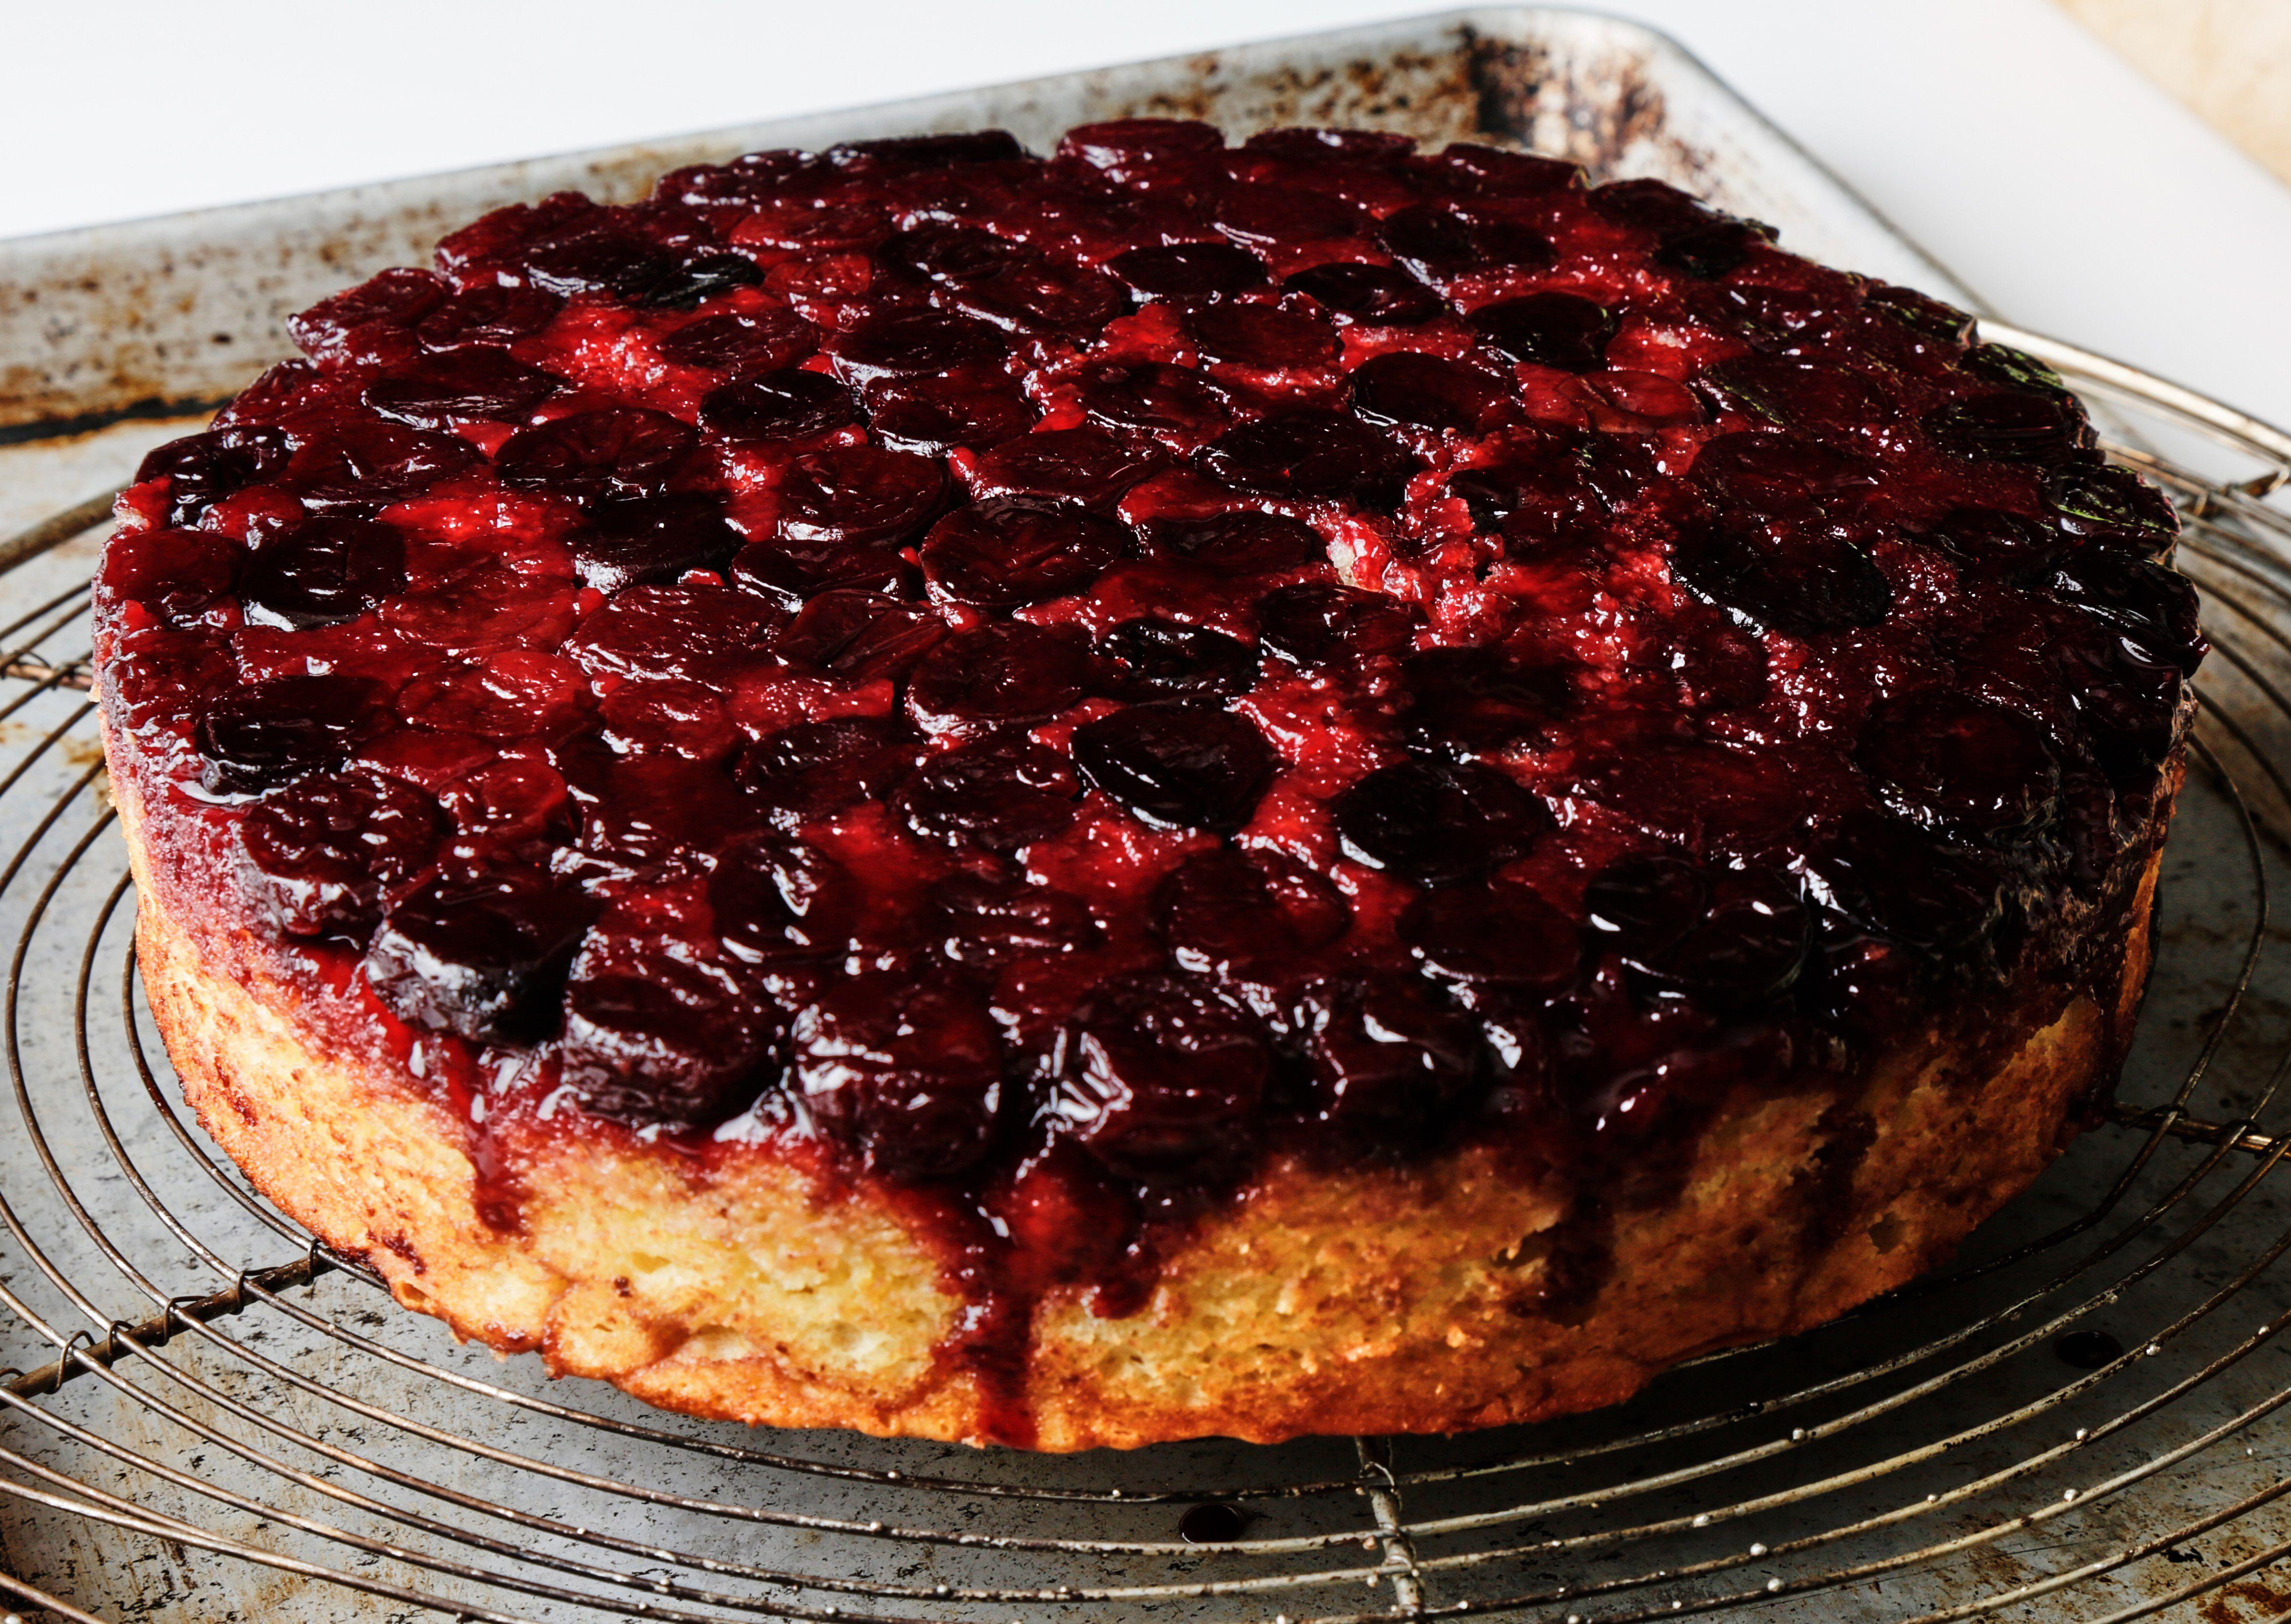 Easy One Bowl Upside Down Cake Recipe Cherry Cake Recipe Cherry Upside Down Cake Cherry Desserts